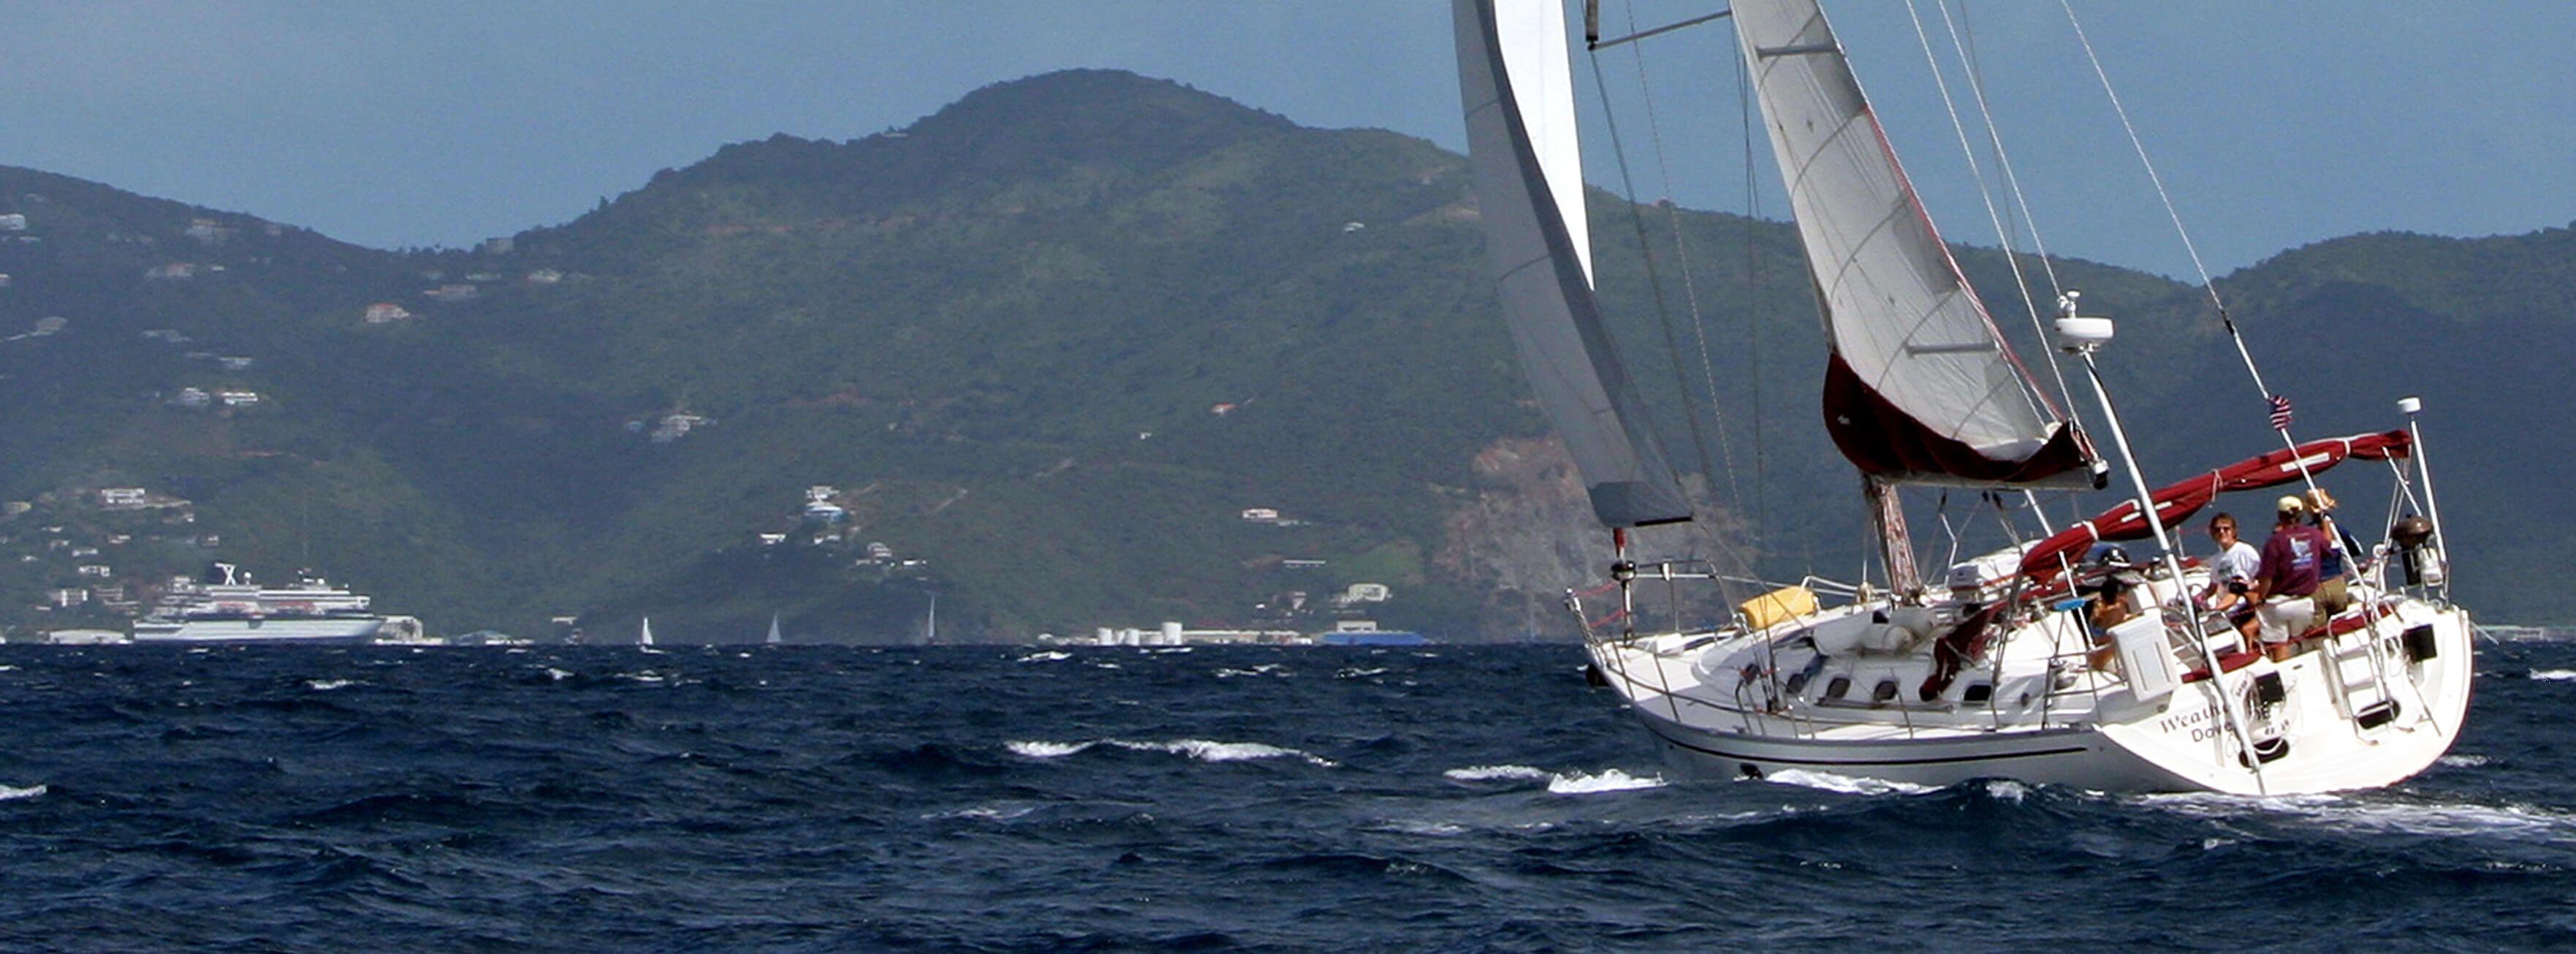 Blue Water Sailing School Sailing Lessons Sailing Courses Asa